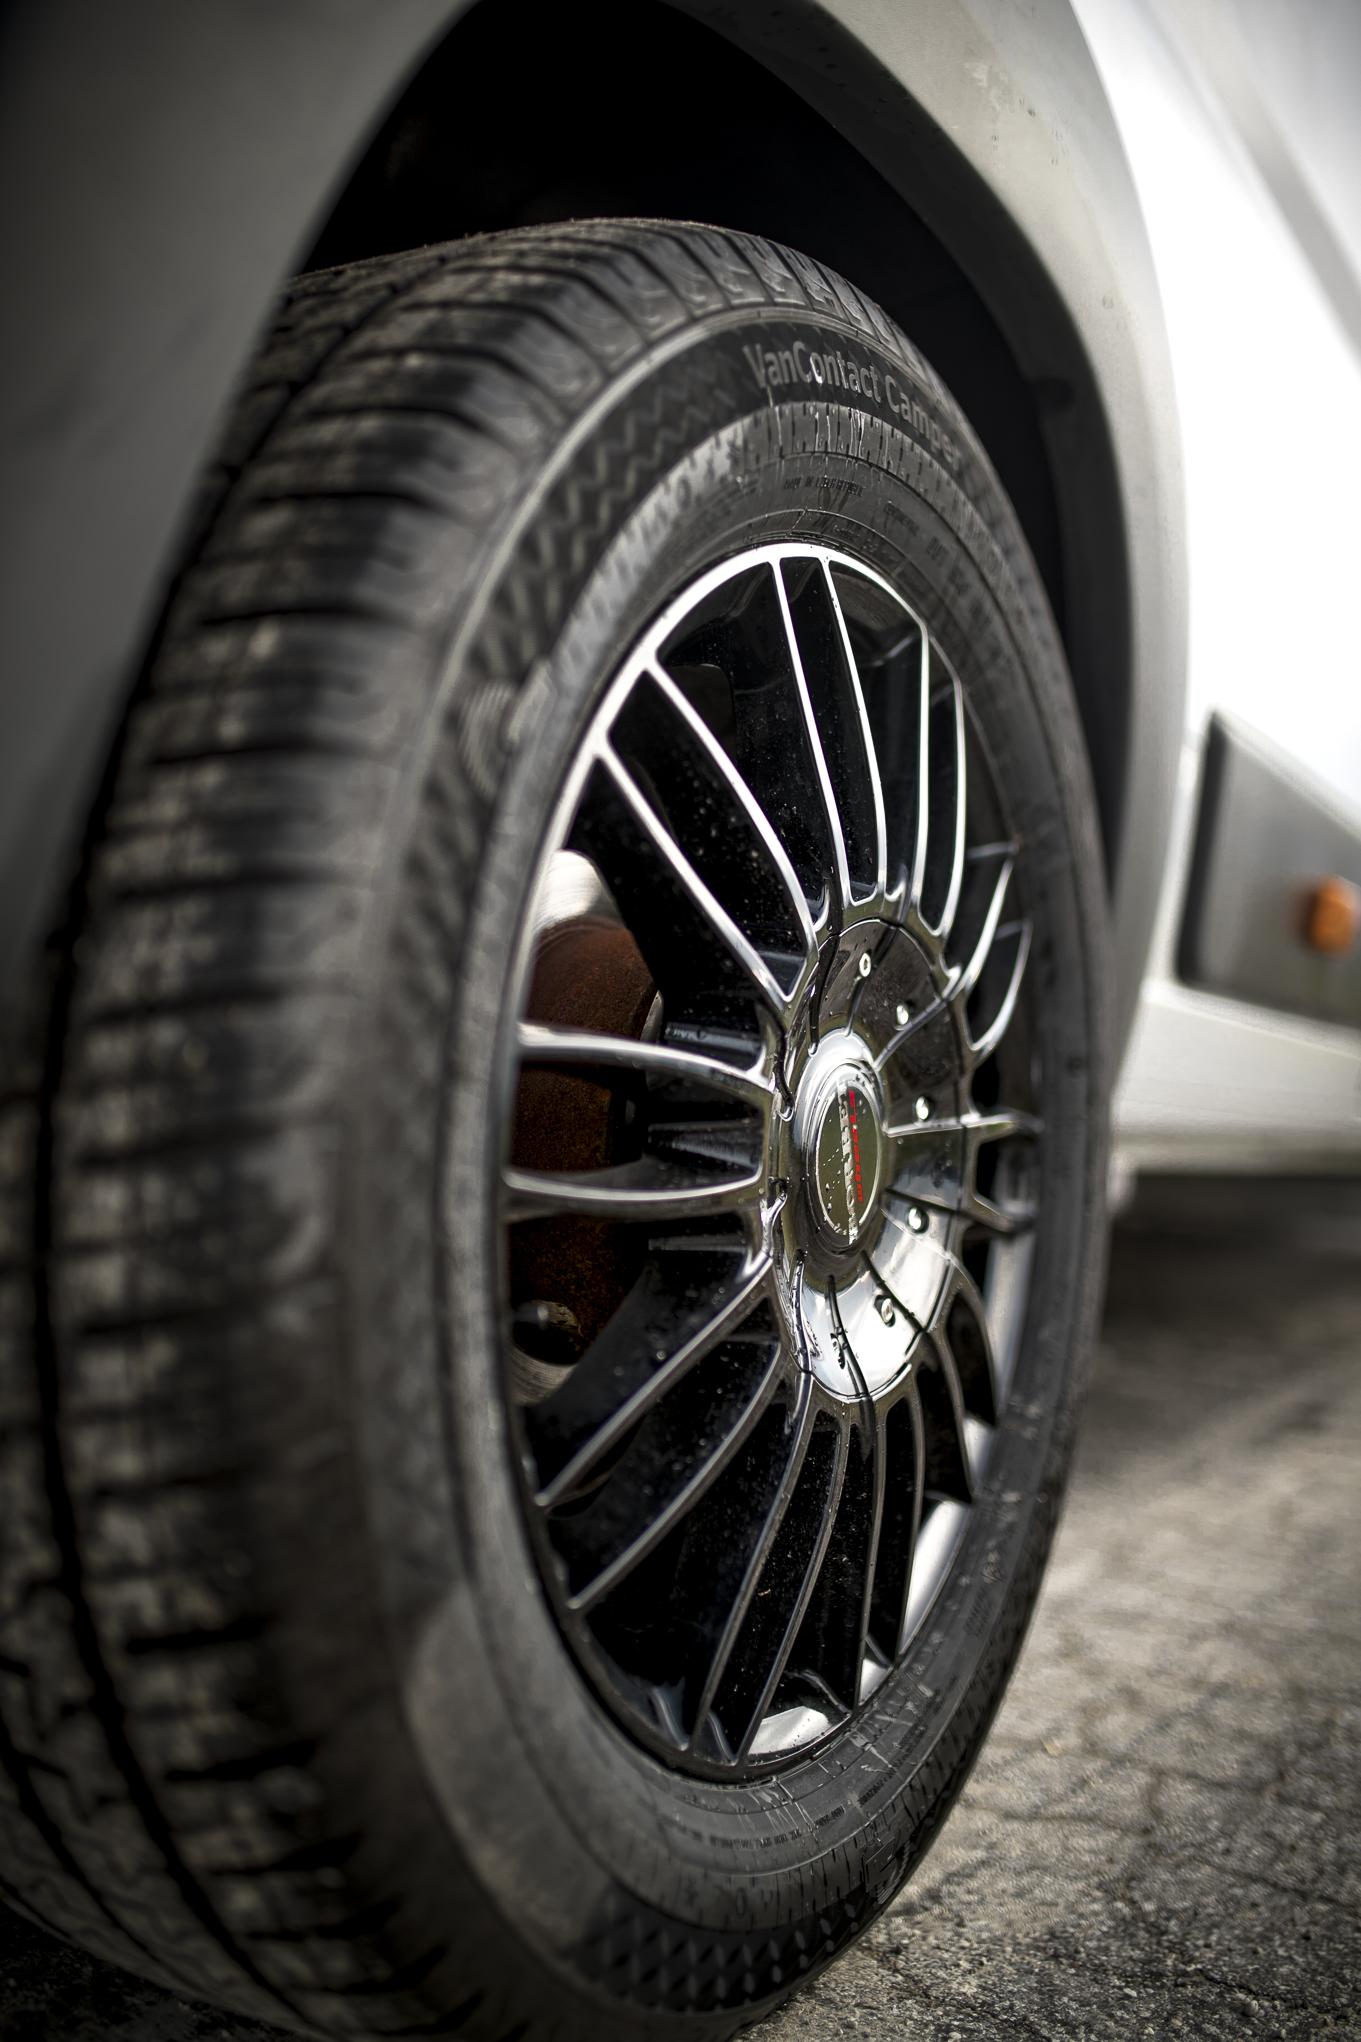 80mm clincher alloy carbon bicycle wheels 700c carbon